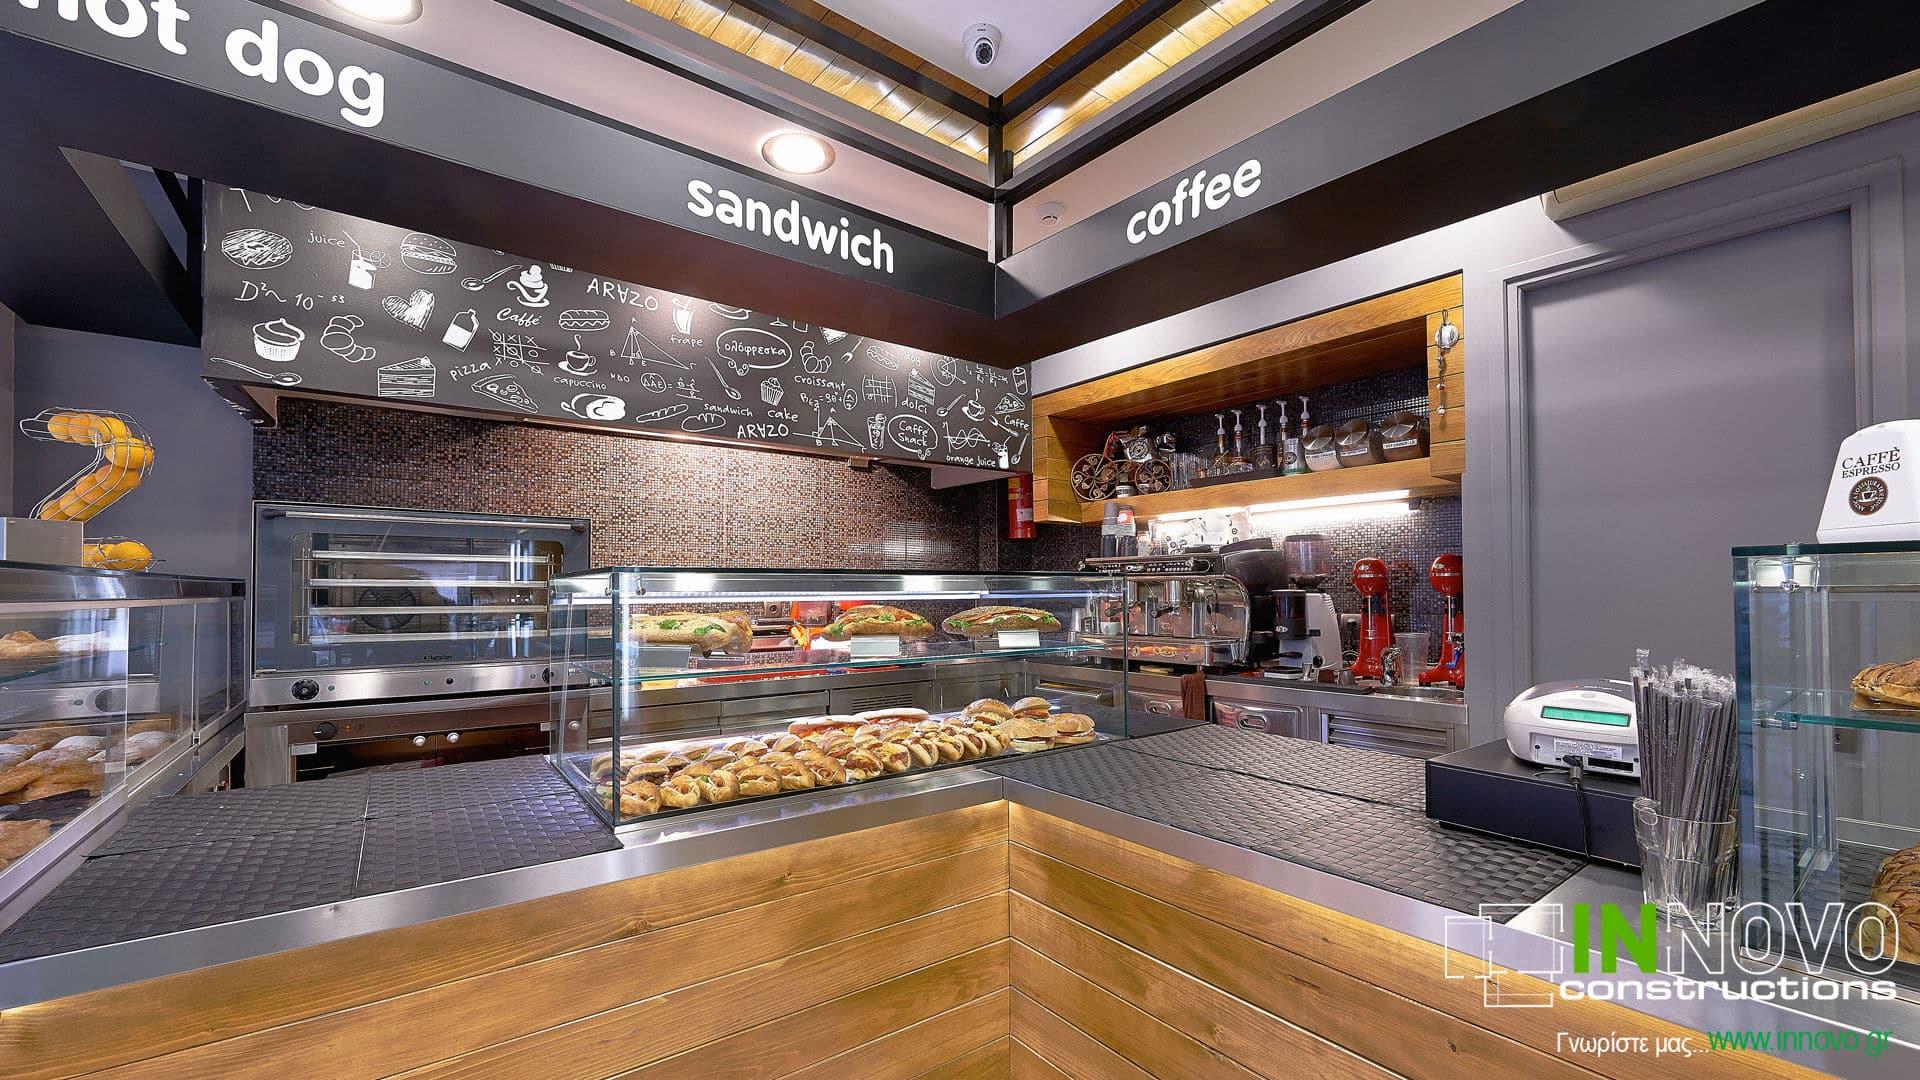 anakainisi-snack-cafe-renovation-snack-cafe-peiraias-1545-20